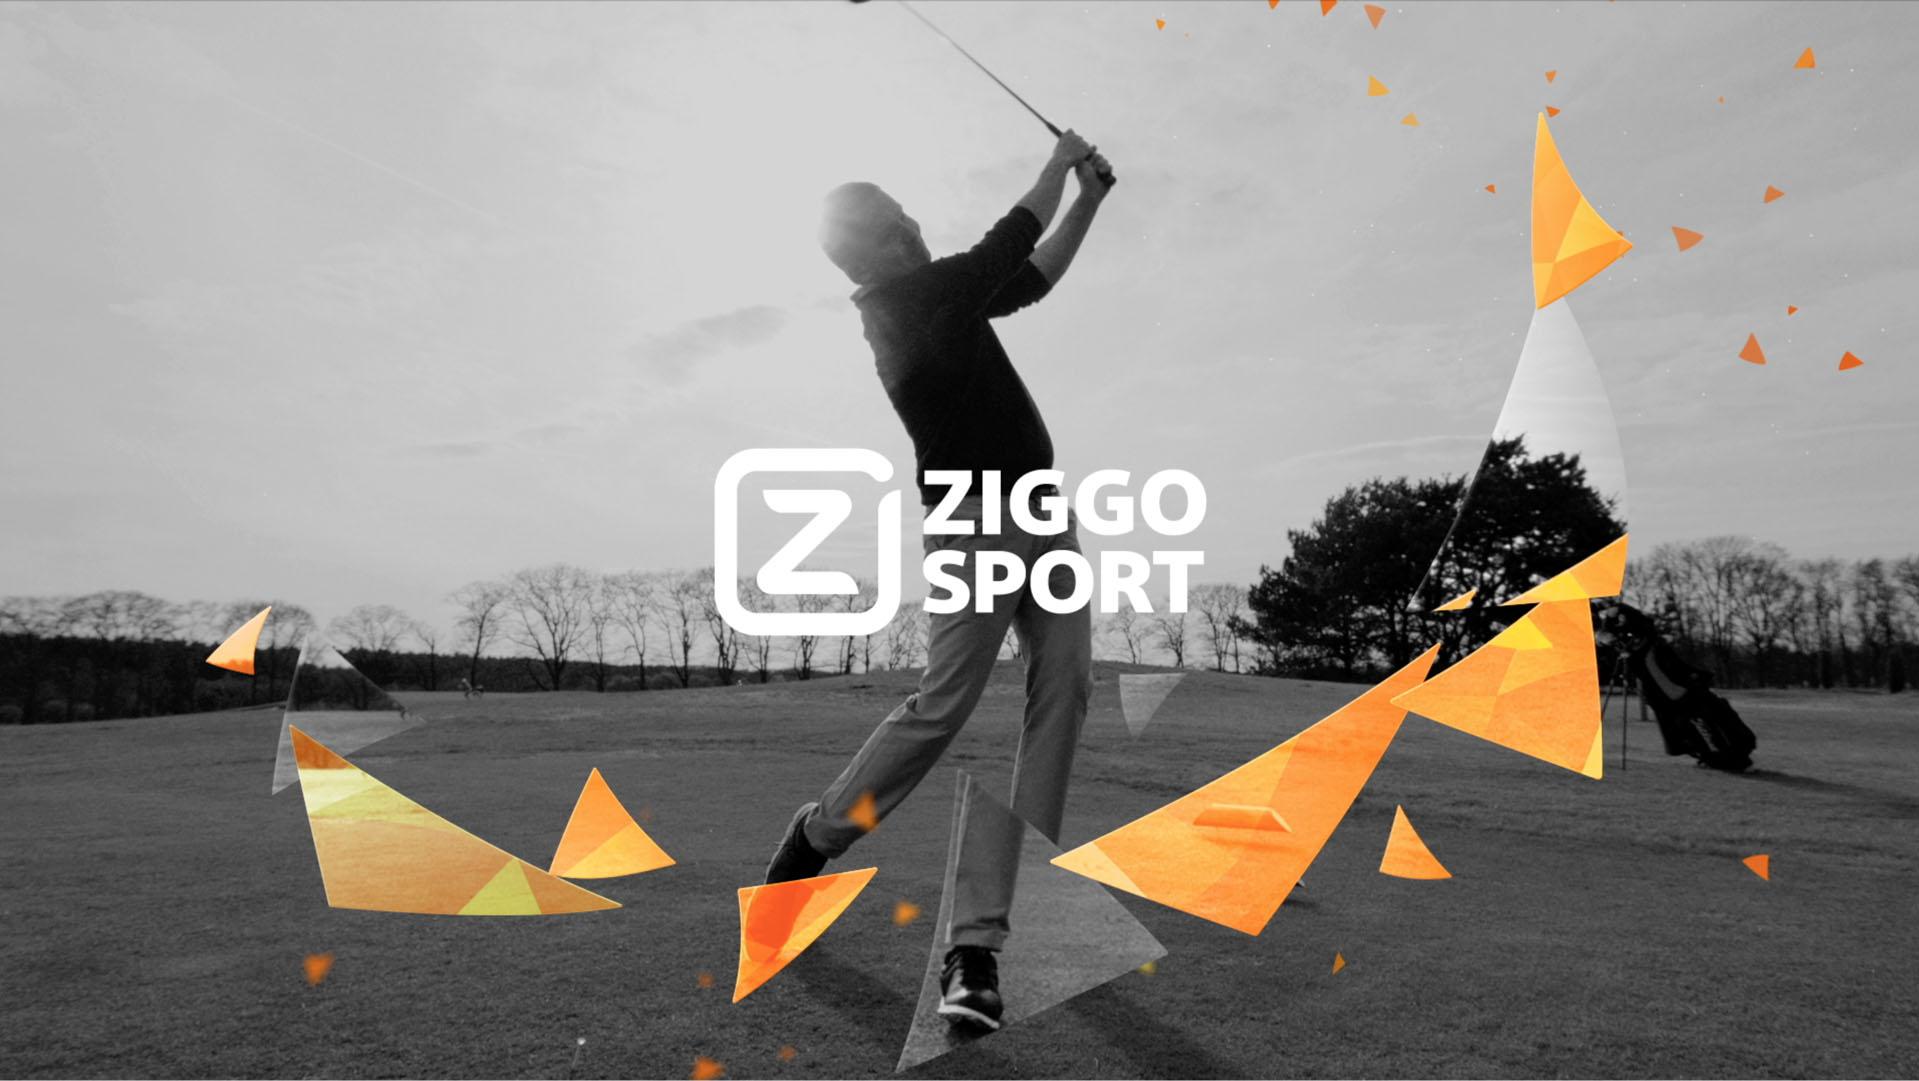 Ziggo Sport Golf Fractals